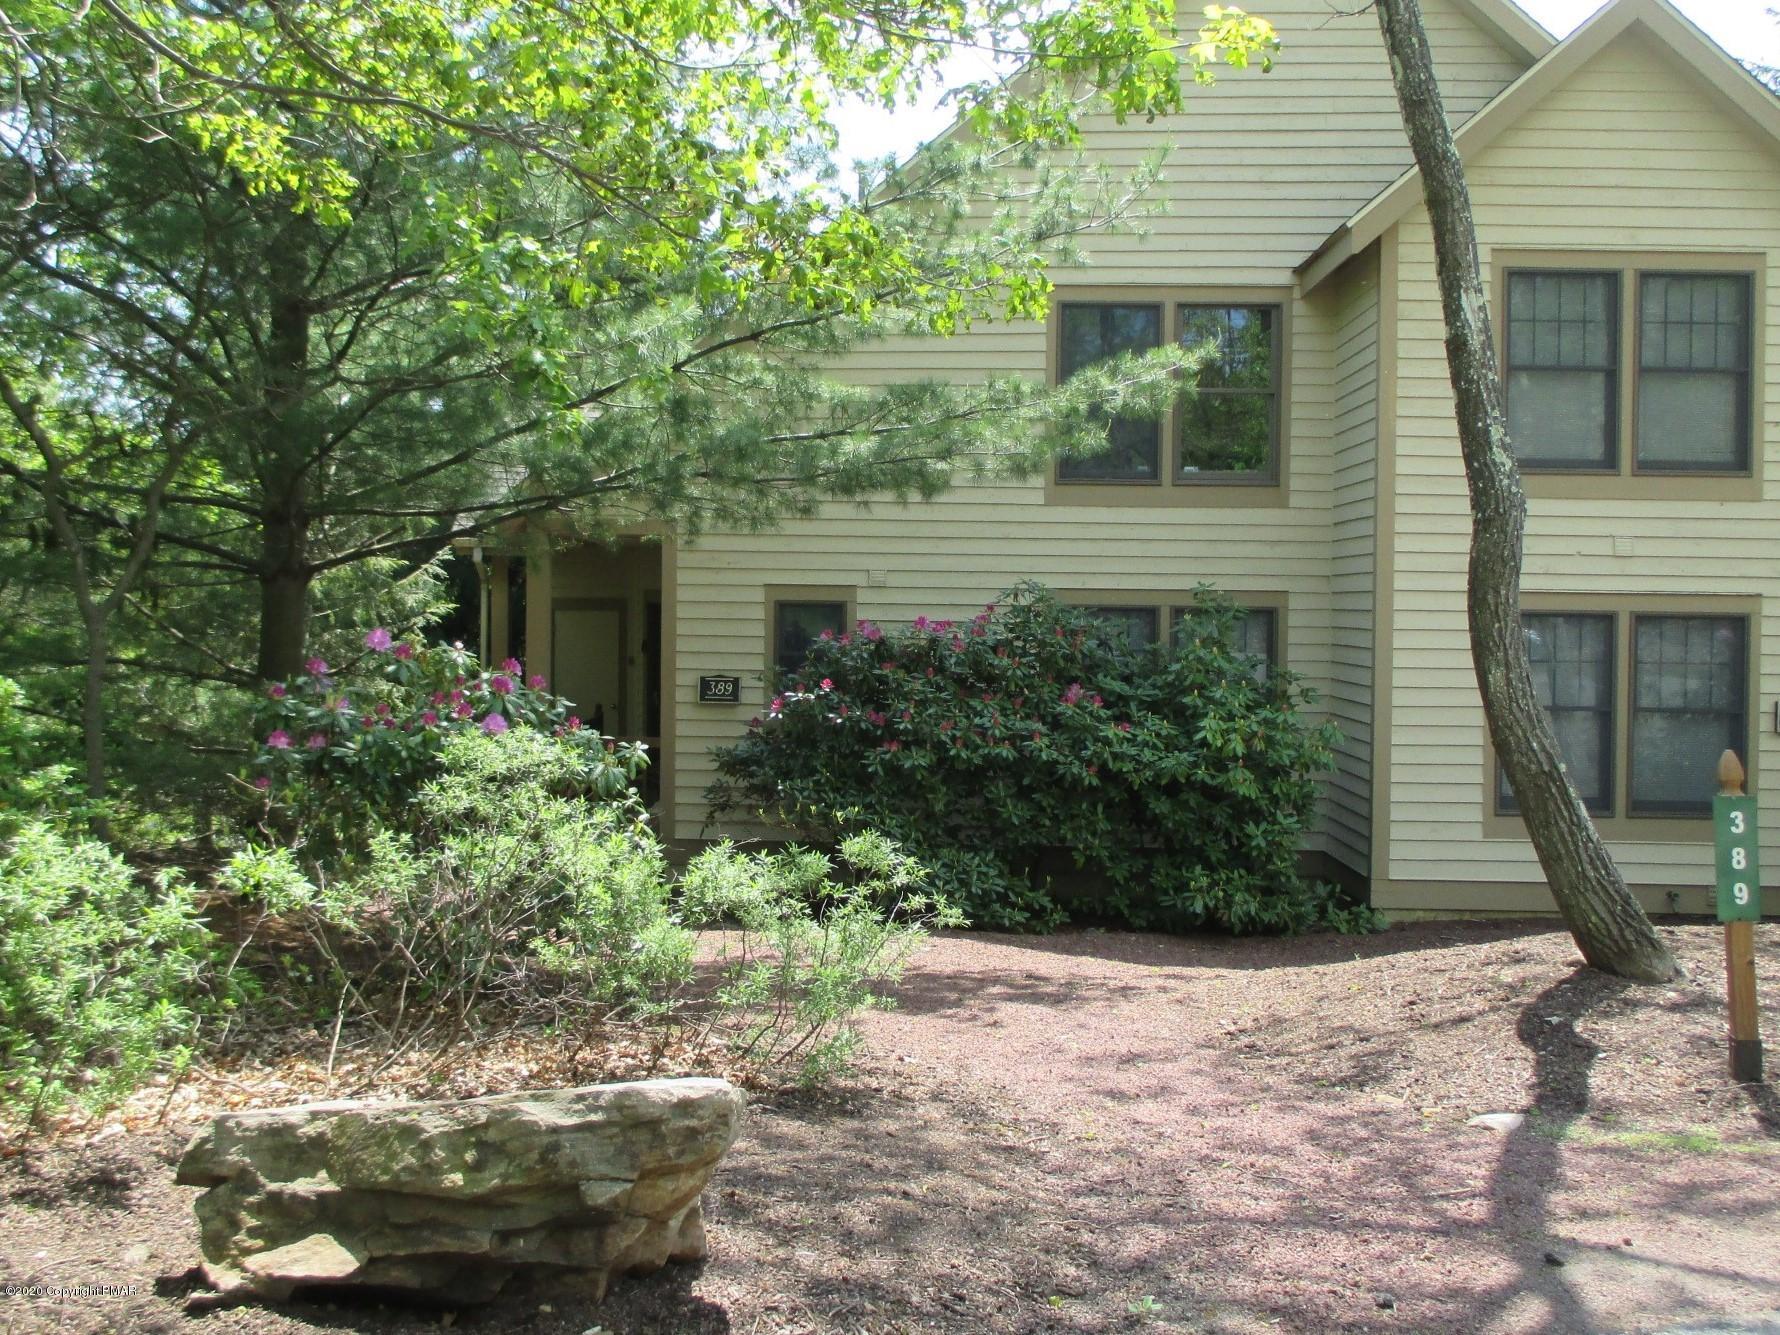 389 Vista Dr, Tannersville, PA 18372